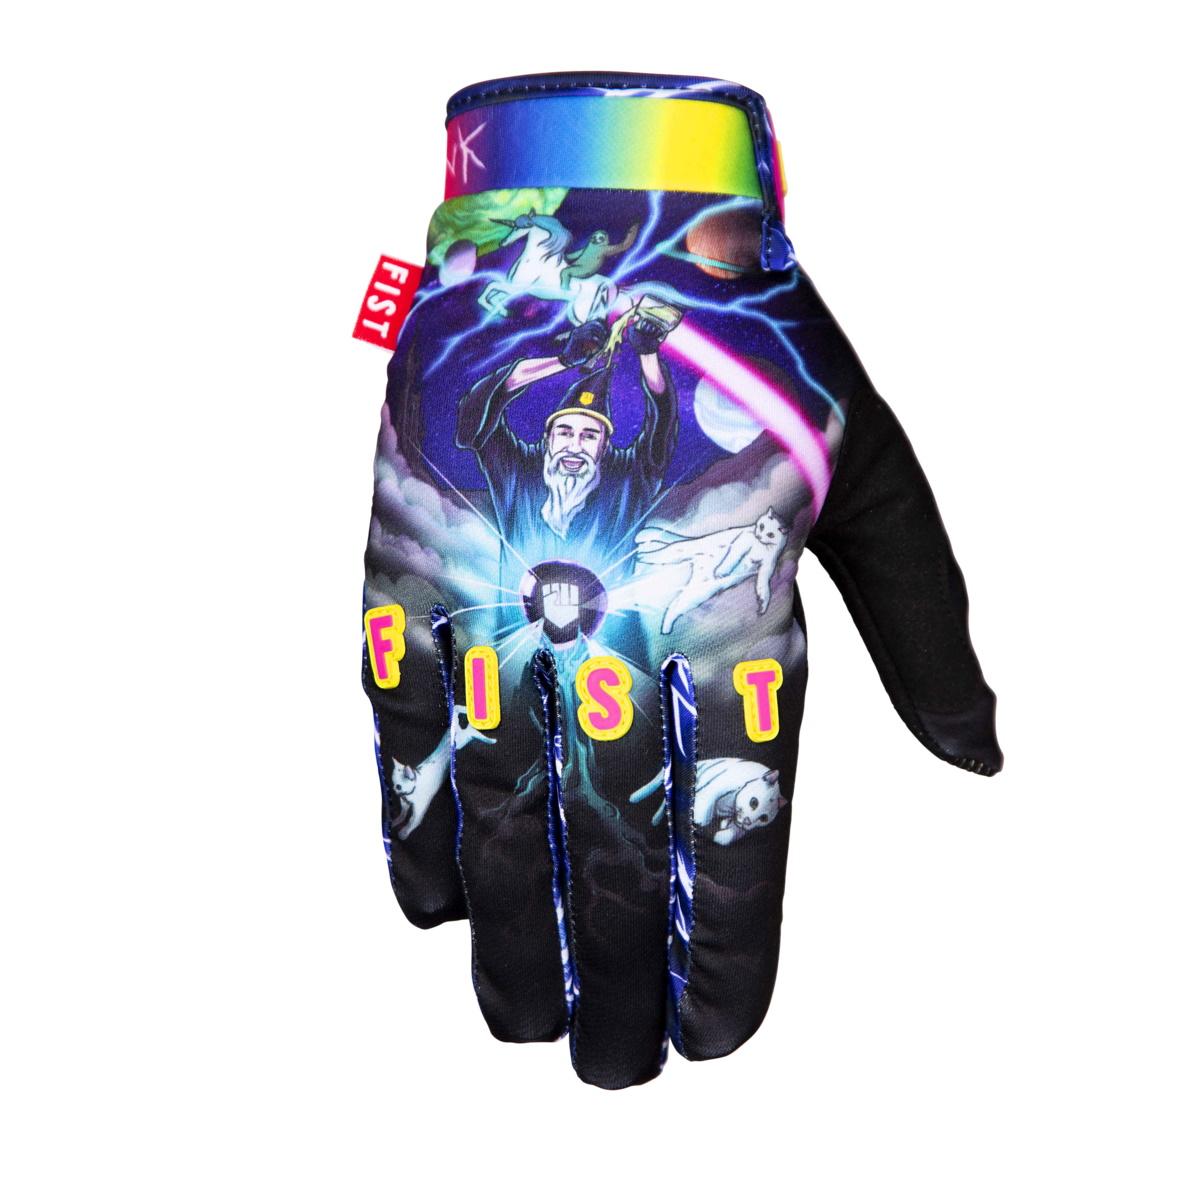 Fist Handwear Harry Bink You're a Wizard 2 Gloves